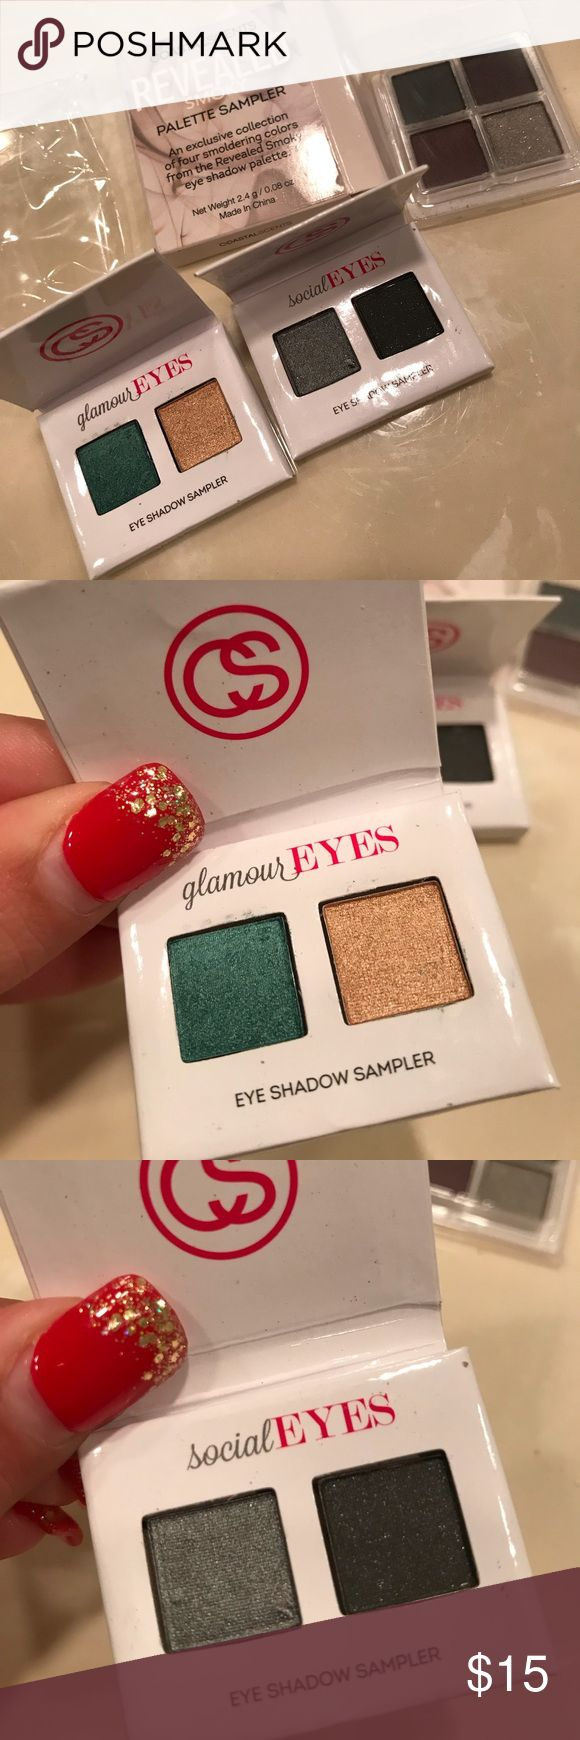 Coastal Scents Eye Shadow Samplers Bundle Of 3 All are brand new. coastal scents Makeup Eyeshadow